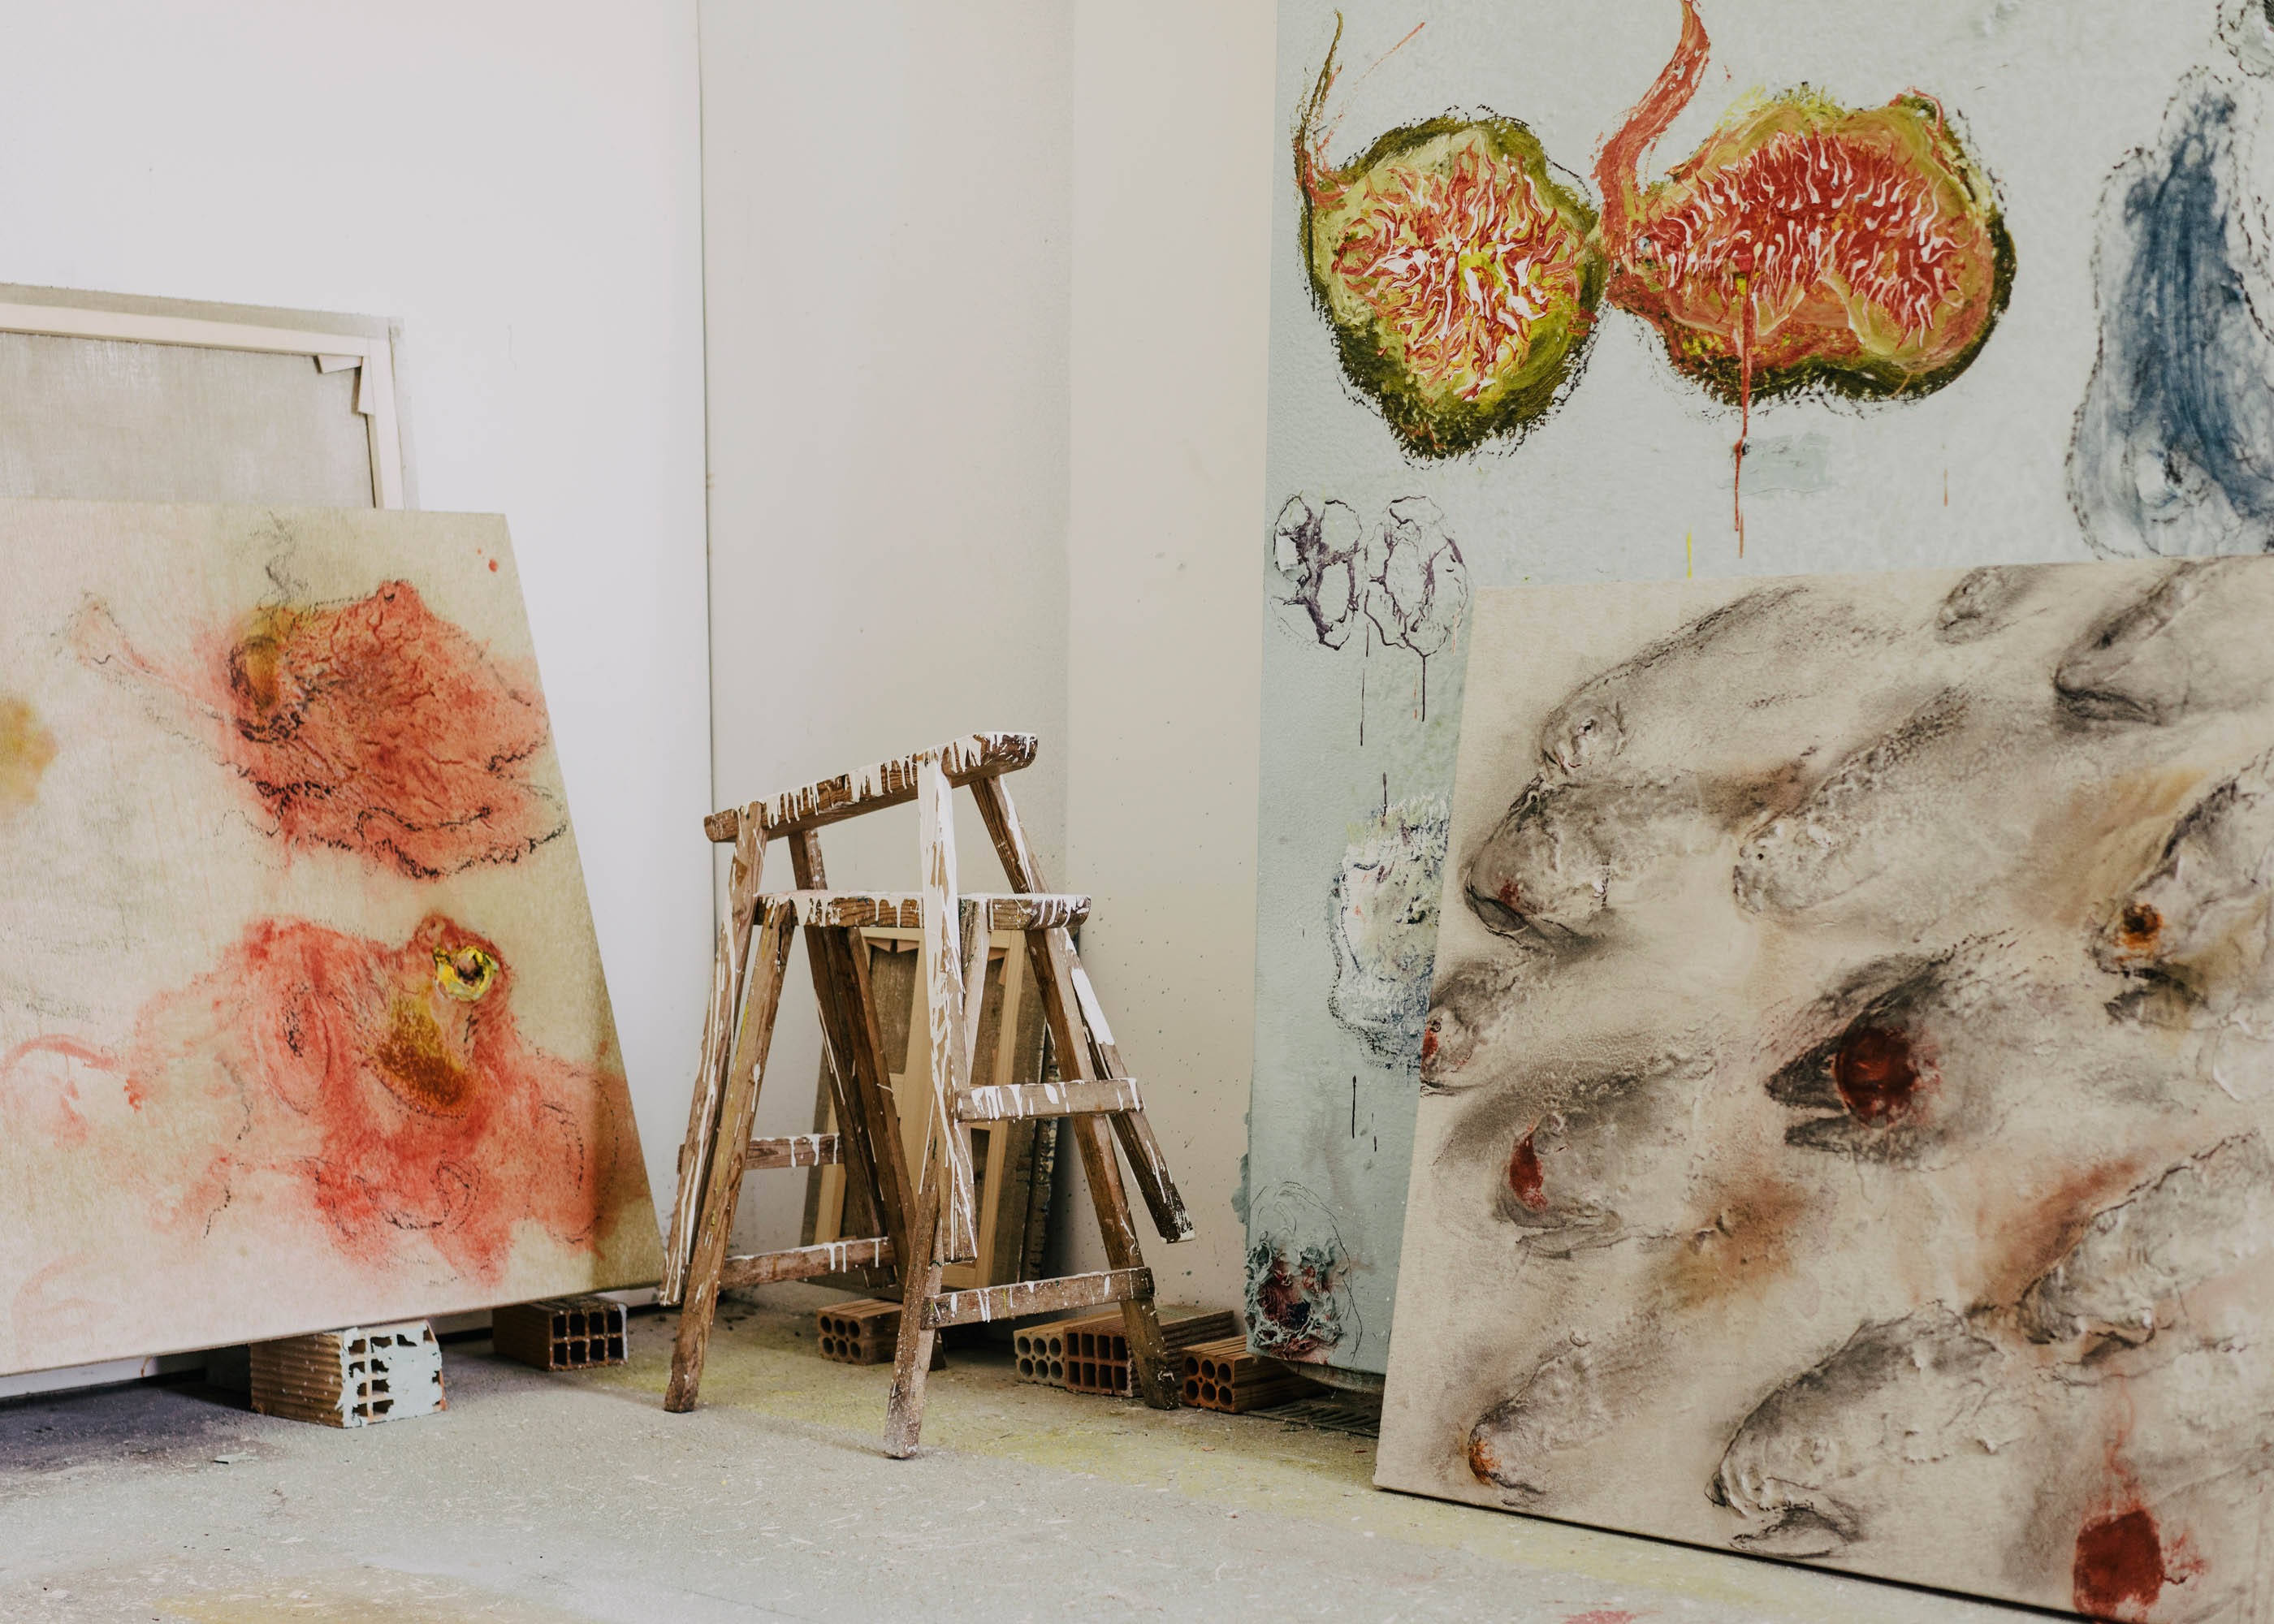 #miquelbarcelo #artist #house #mallorca #editorial #wsj #wallstreetjournal